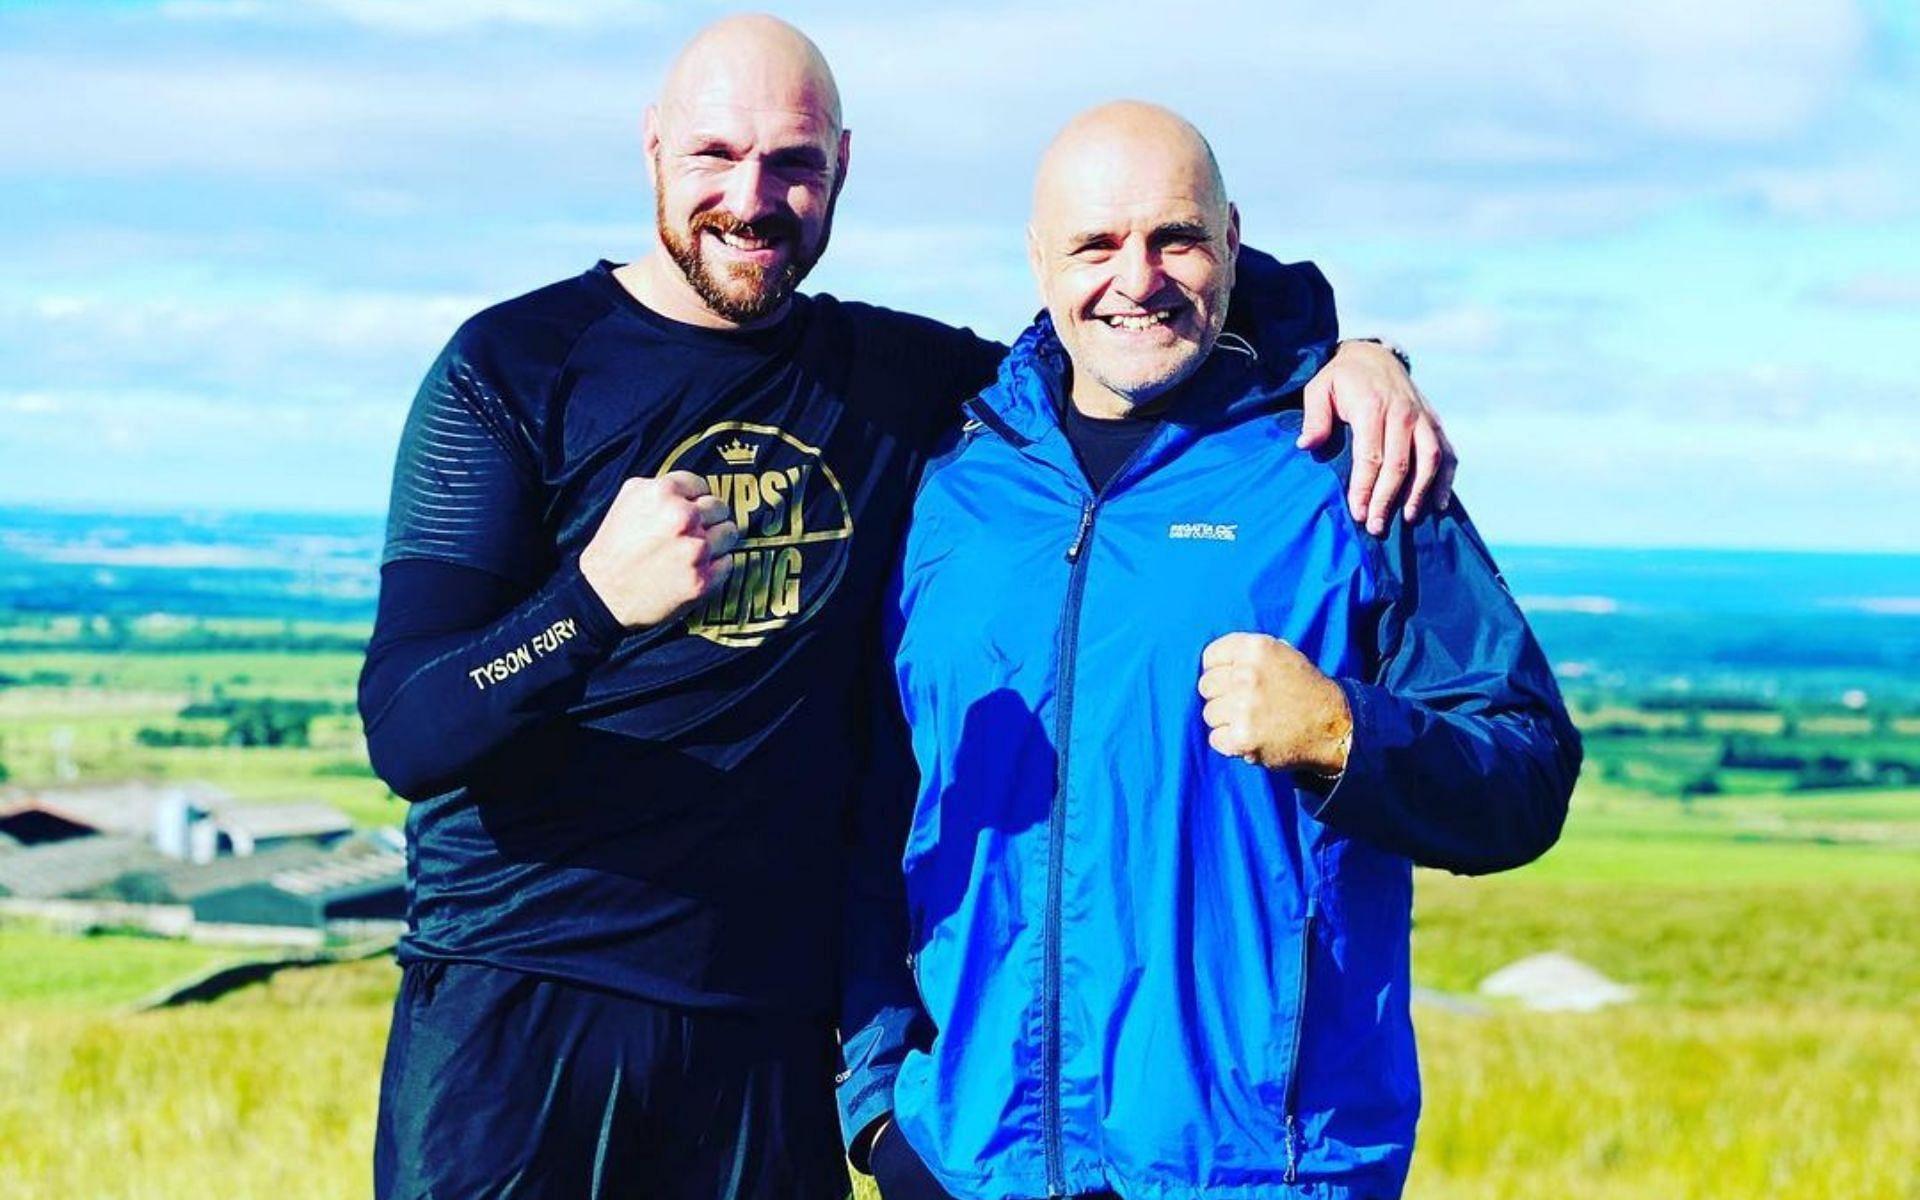 Tyson Fury and John Fury [Photo via @gypsyjohnfury on Instagram]